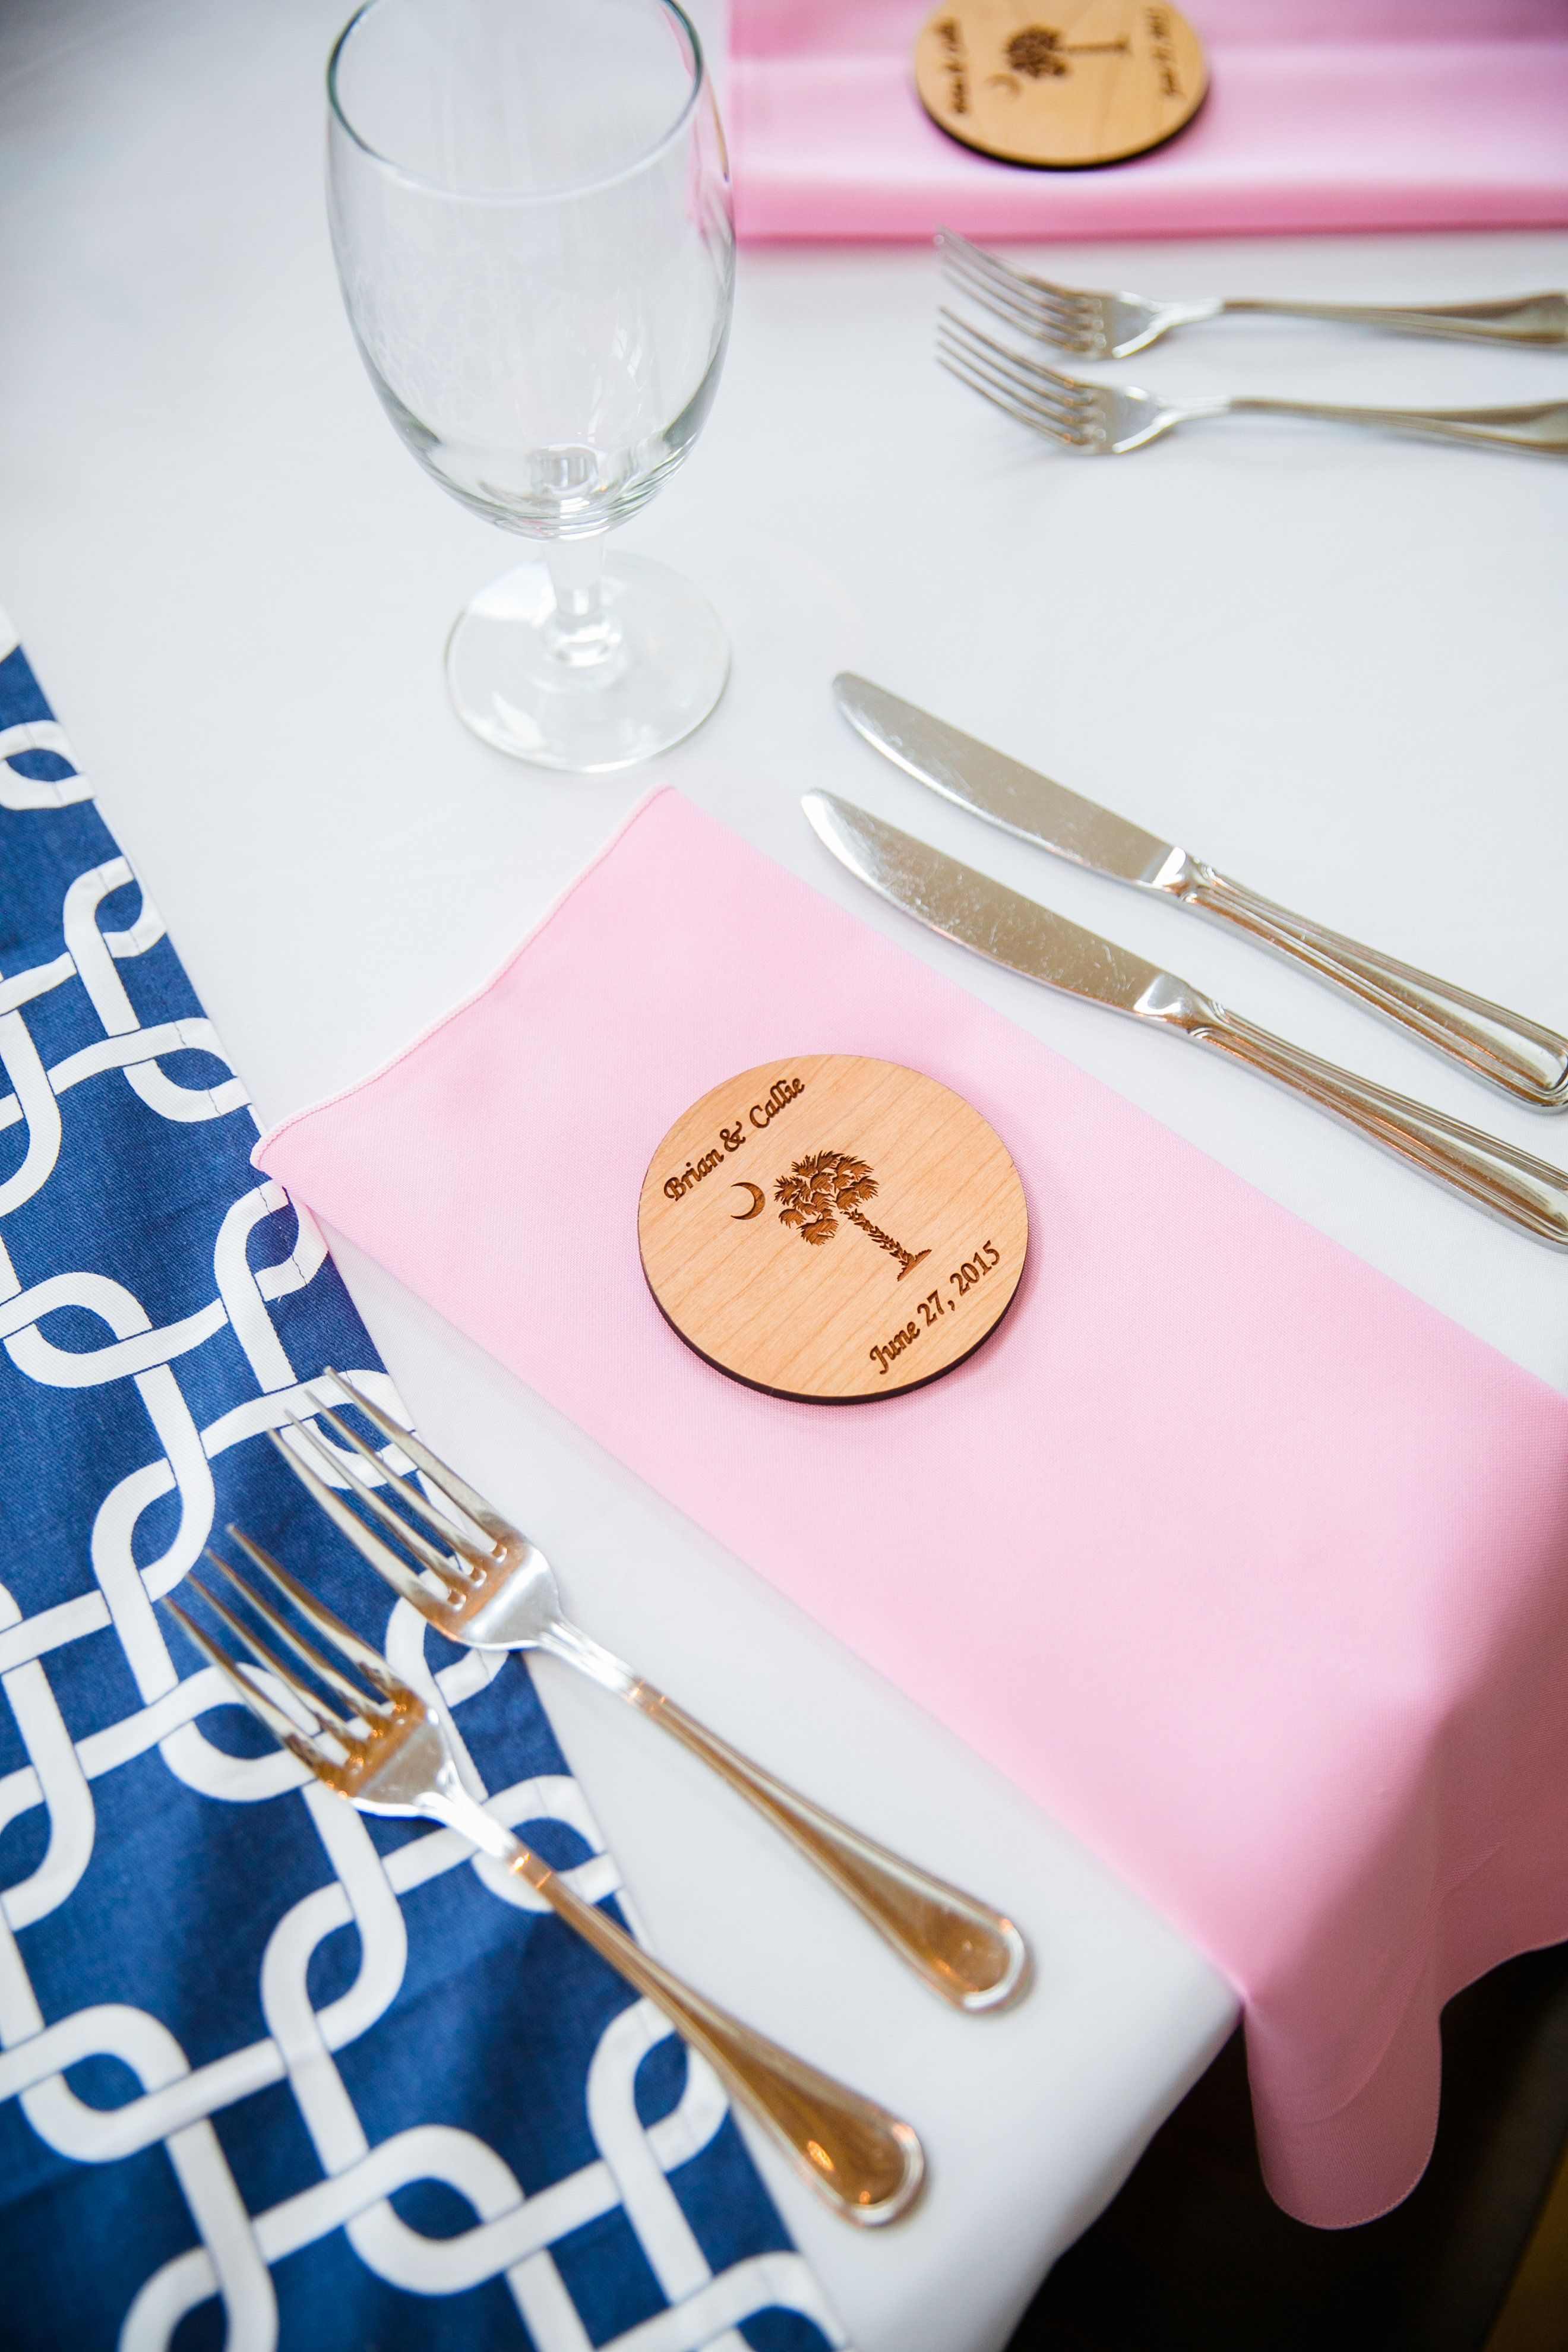 Diy wooden coasters wedding ideas pinterest coasters and weddings